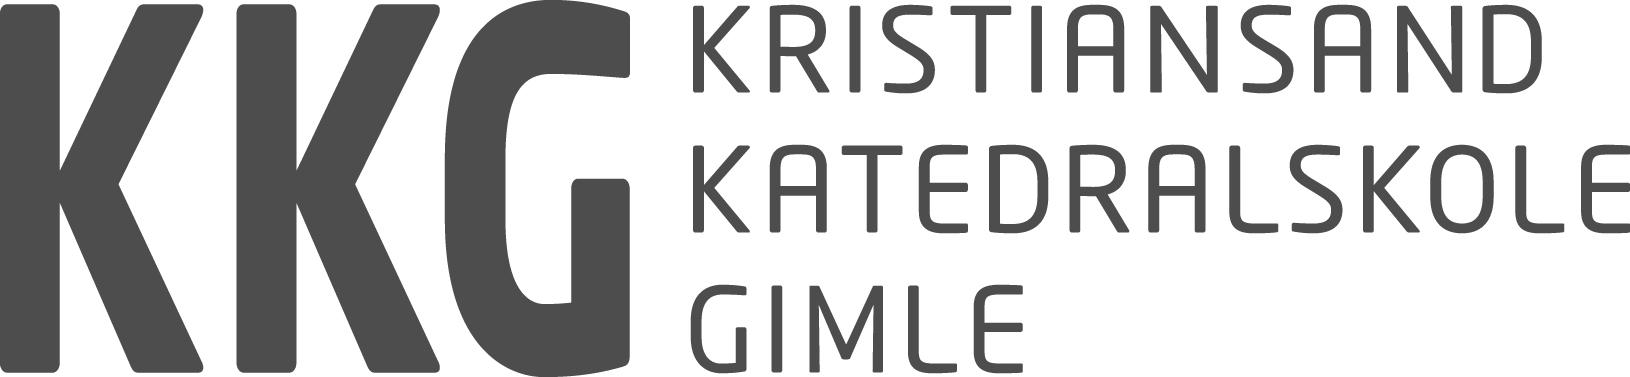 KKG Kristiansand Katedralskole Gimle